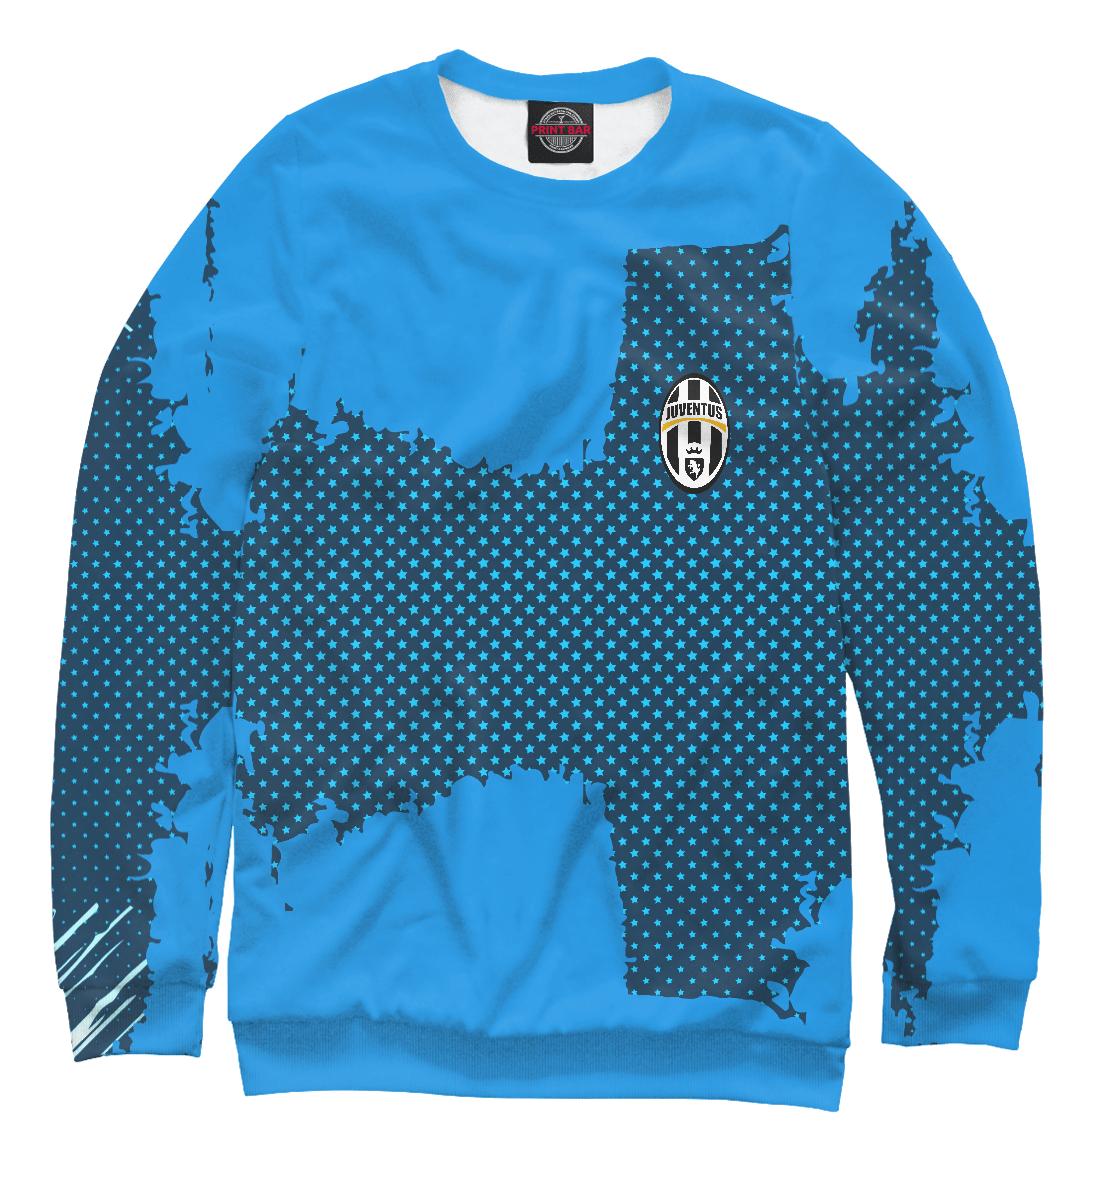 Купить Juventus sport collection, Printbar, Свитшоты, JUV-333783-swi-2